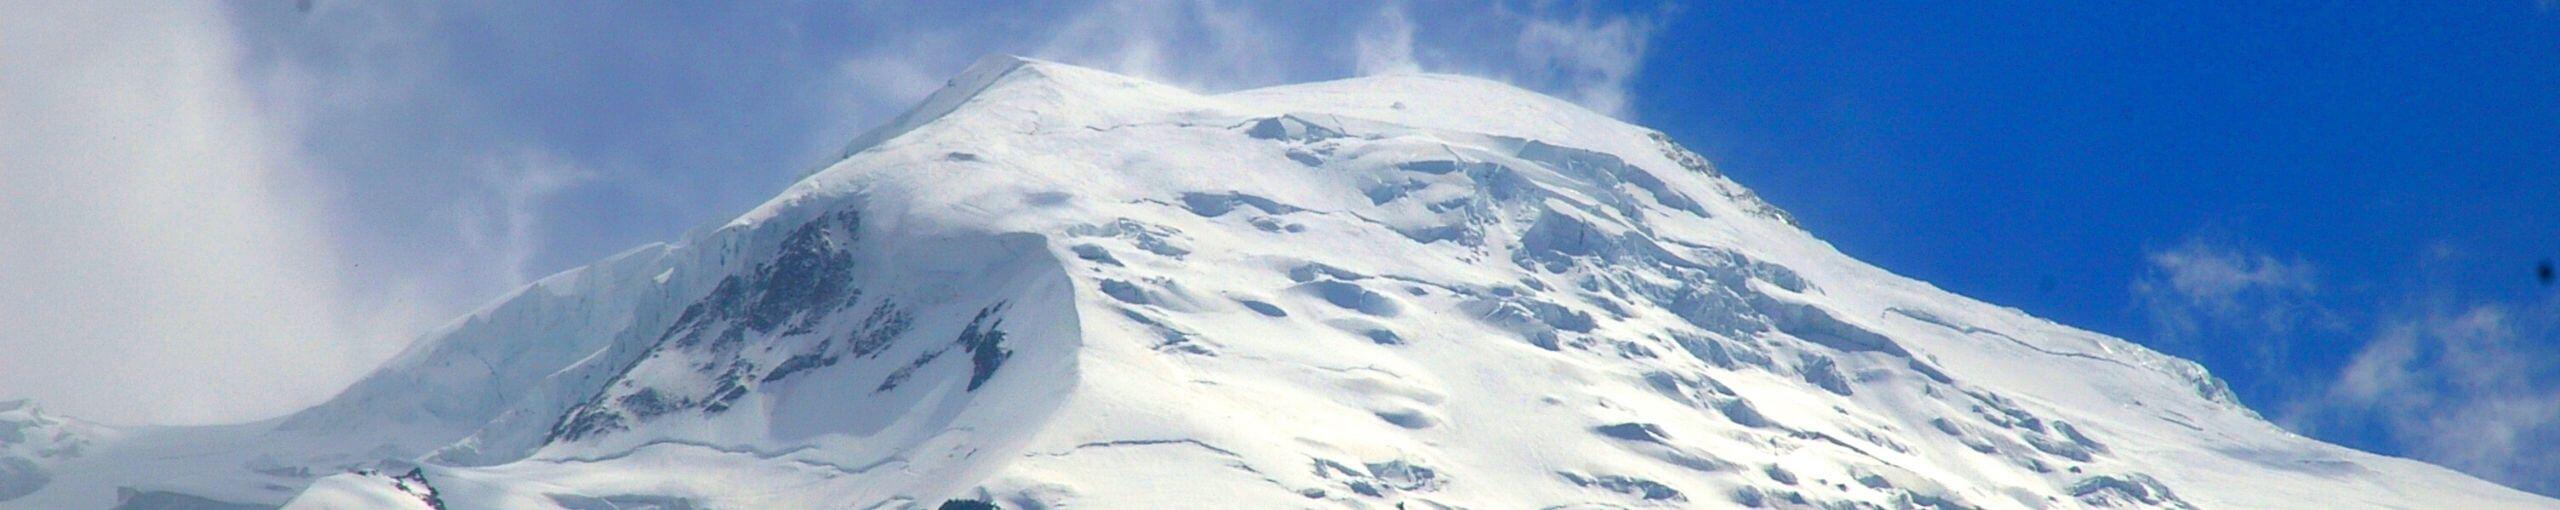 Tour del Mont Blanc. Cordillera de los Alpes. Francia.